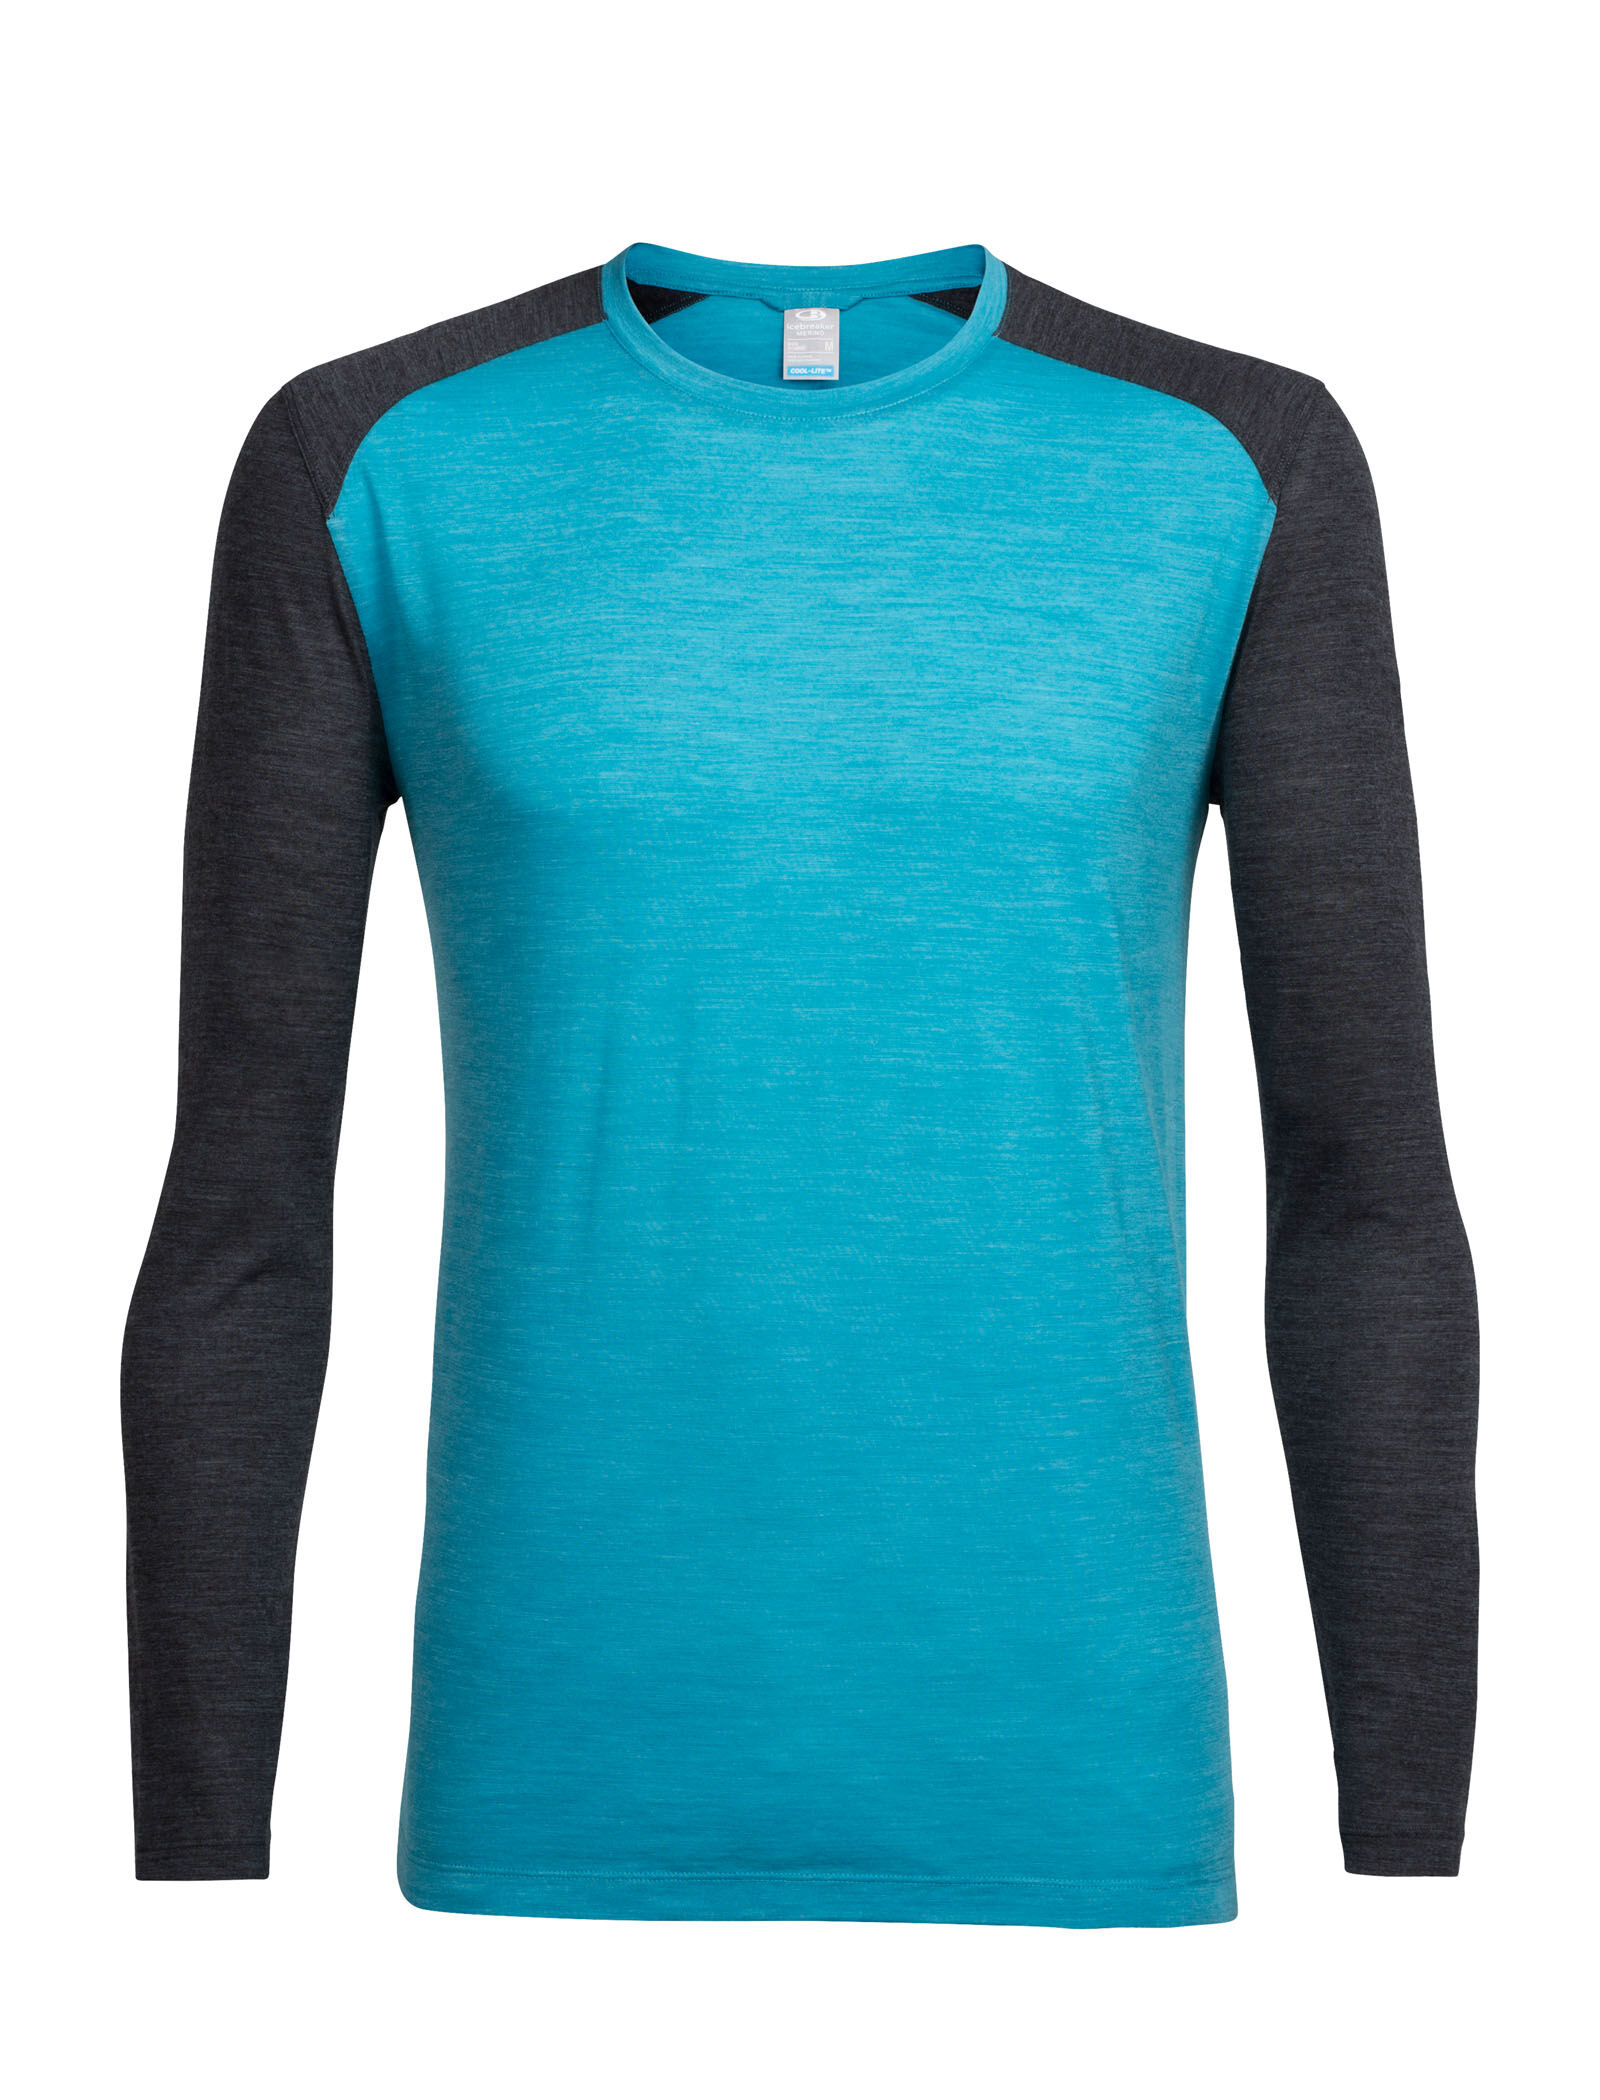 New Zealand Merino Wool 102227 Icebreaker Merino Sphere Long Sleeve Crew Neck Shirt for Travel Or Hiking